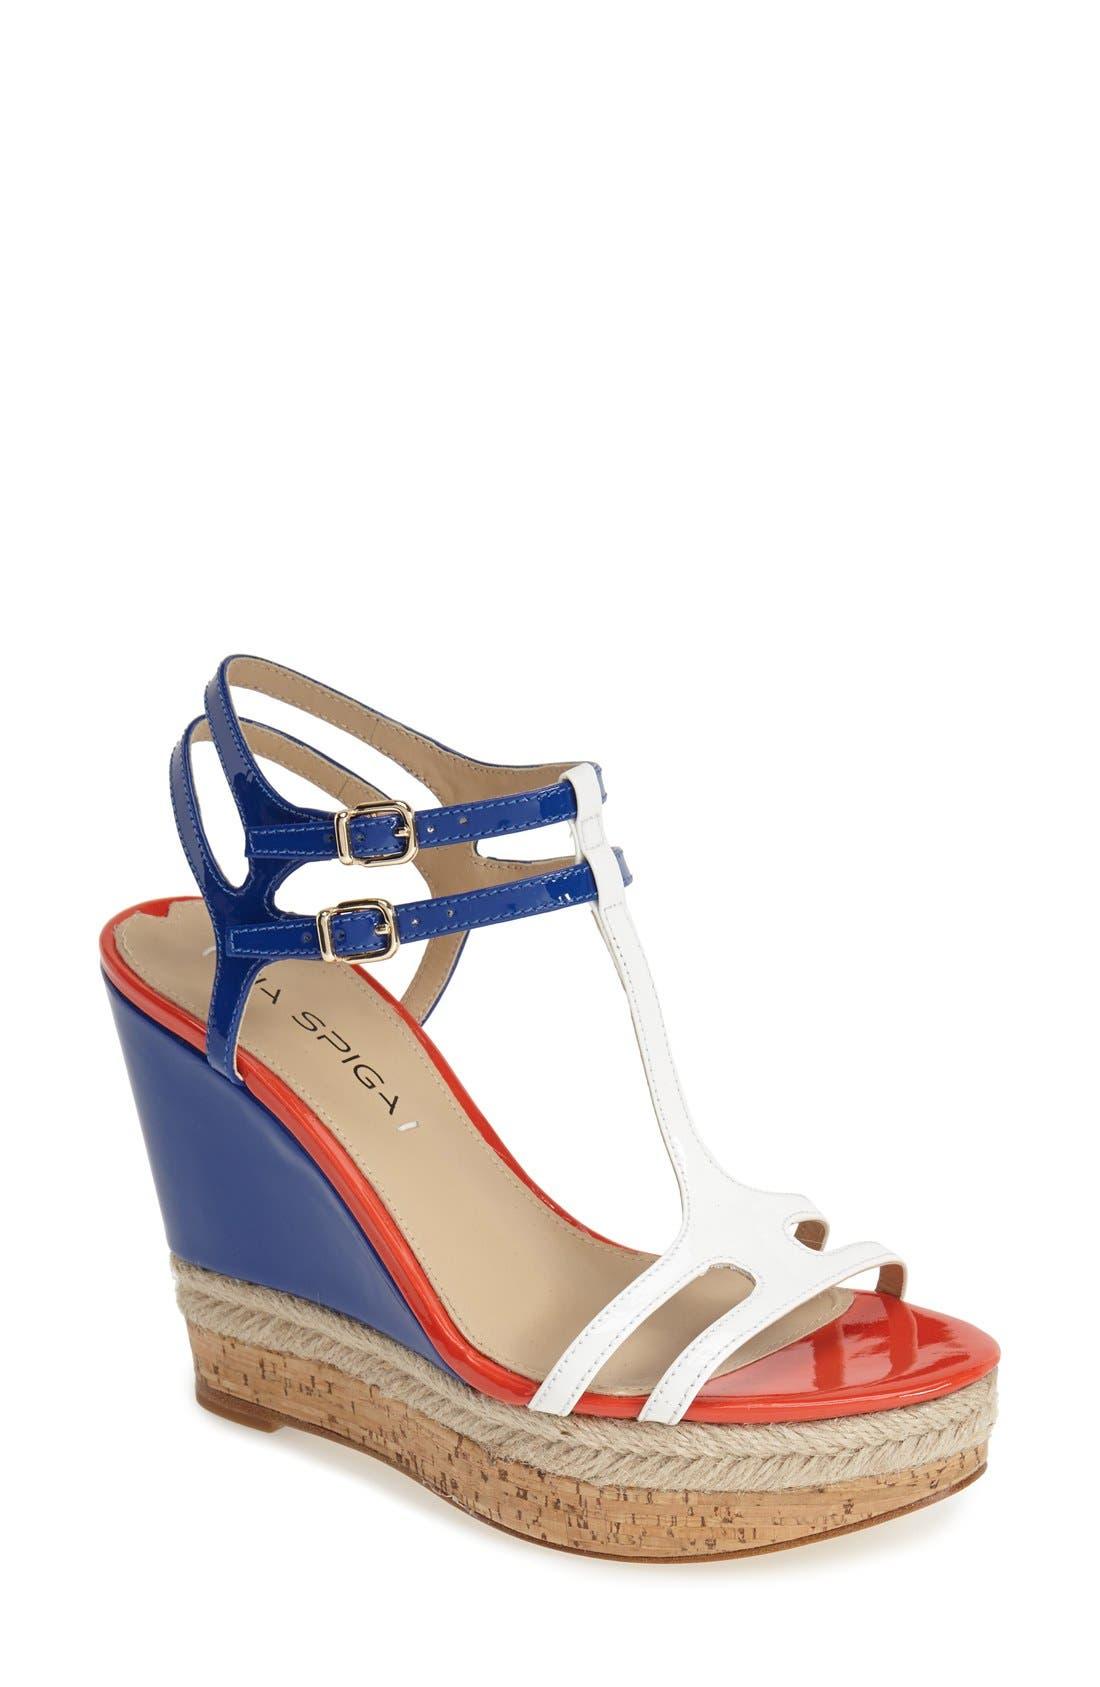 Alternate Image 1 Selected - Via Spiga 'Meza' Leather Dual Ankle Strap Platform Wedge (Women) (Nordstrom Exclusive)